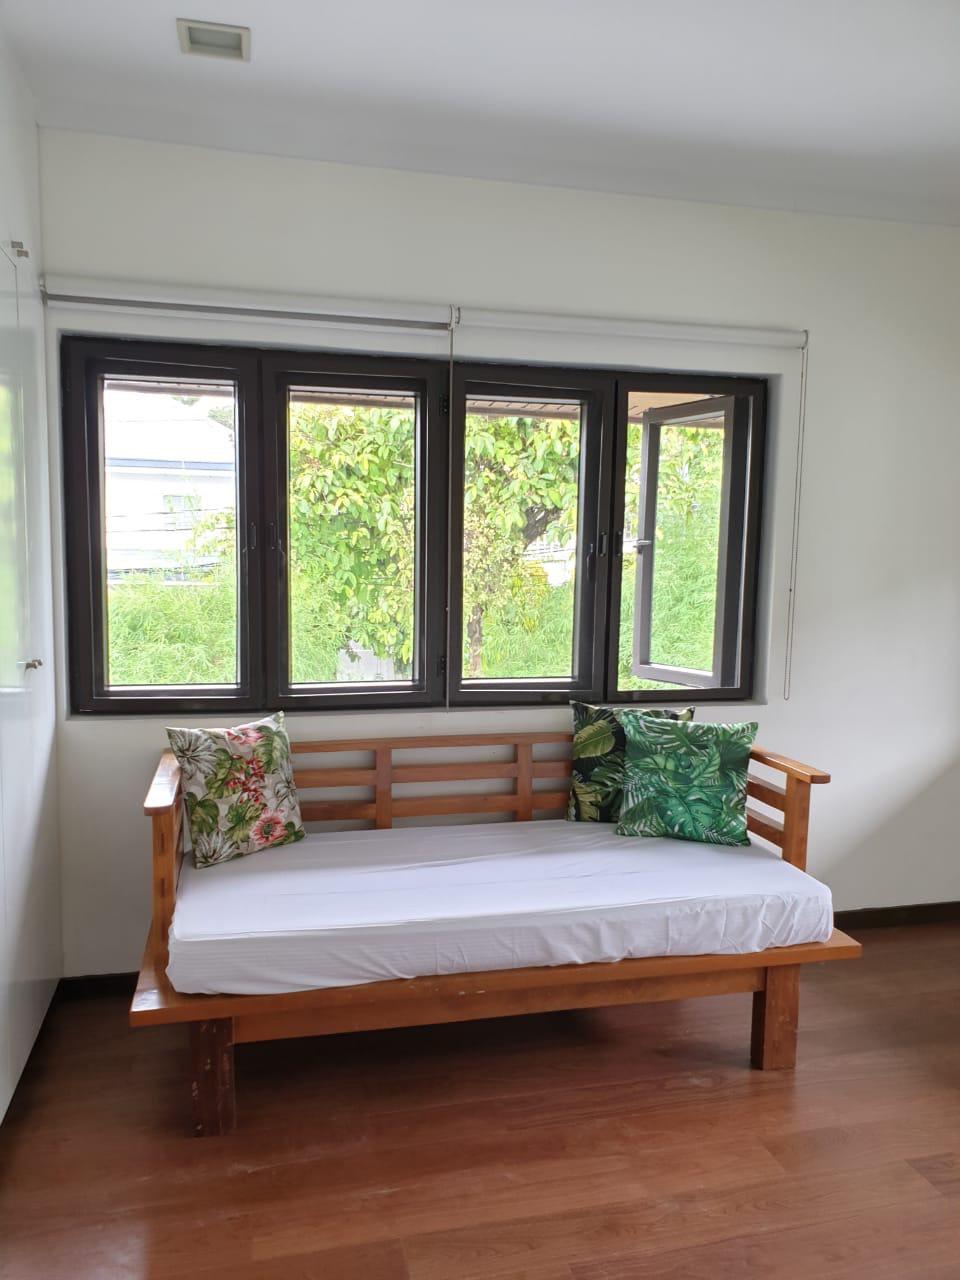 4 Bedrooms House For Sale, Ayala Alabang 11